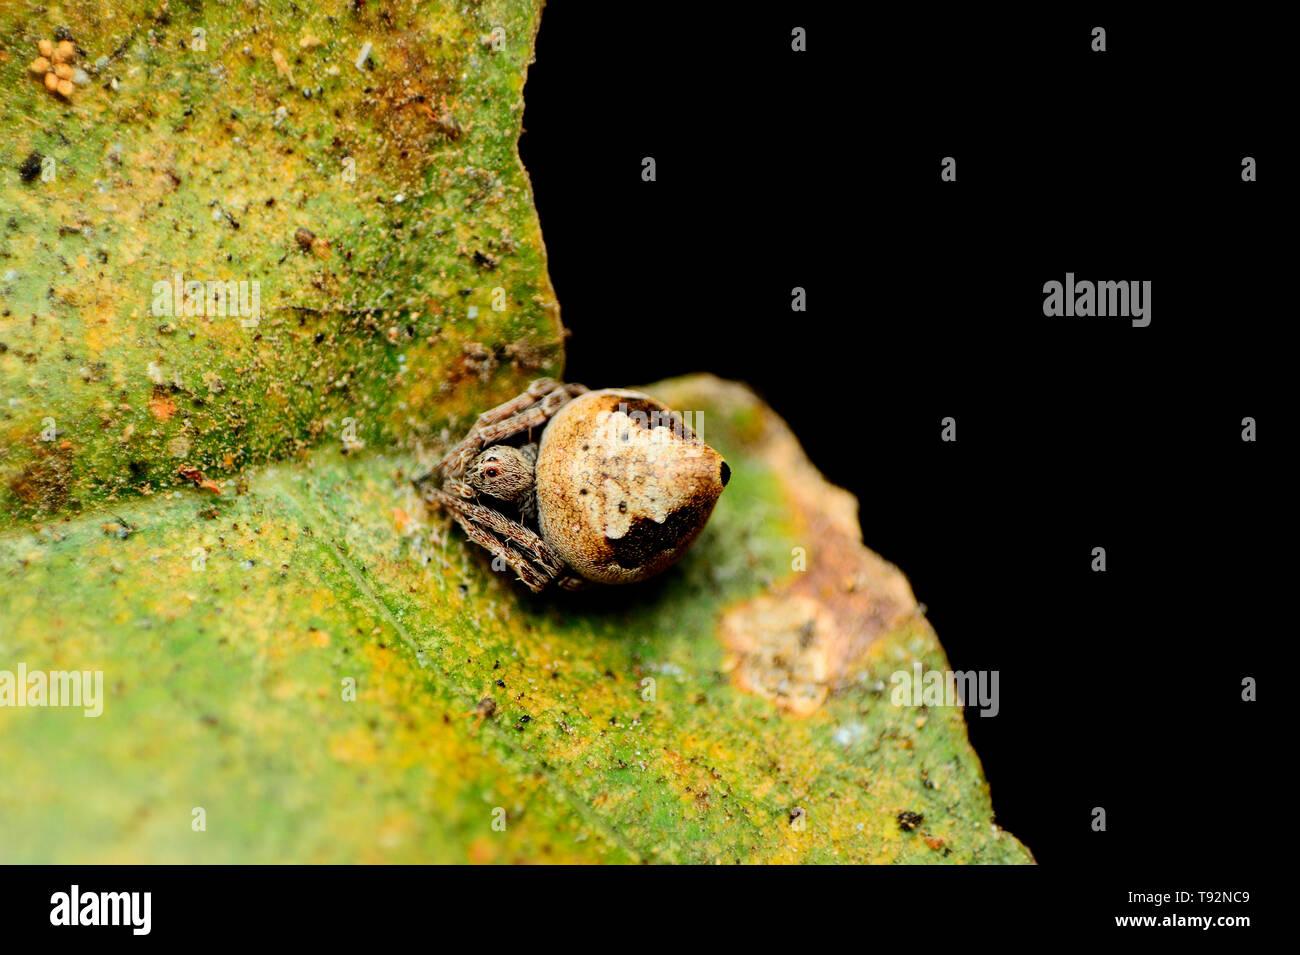 Erovixia sp, Araneidae, Satara, Maharashtra, India. - Stock Image